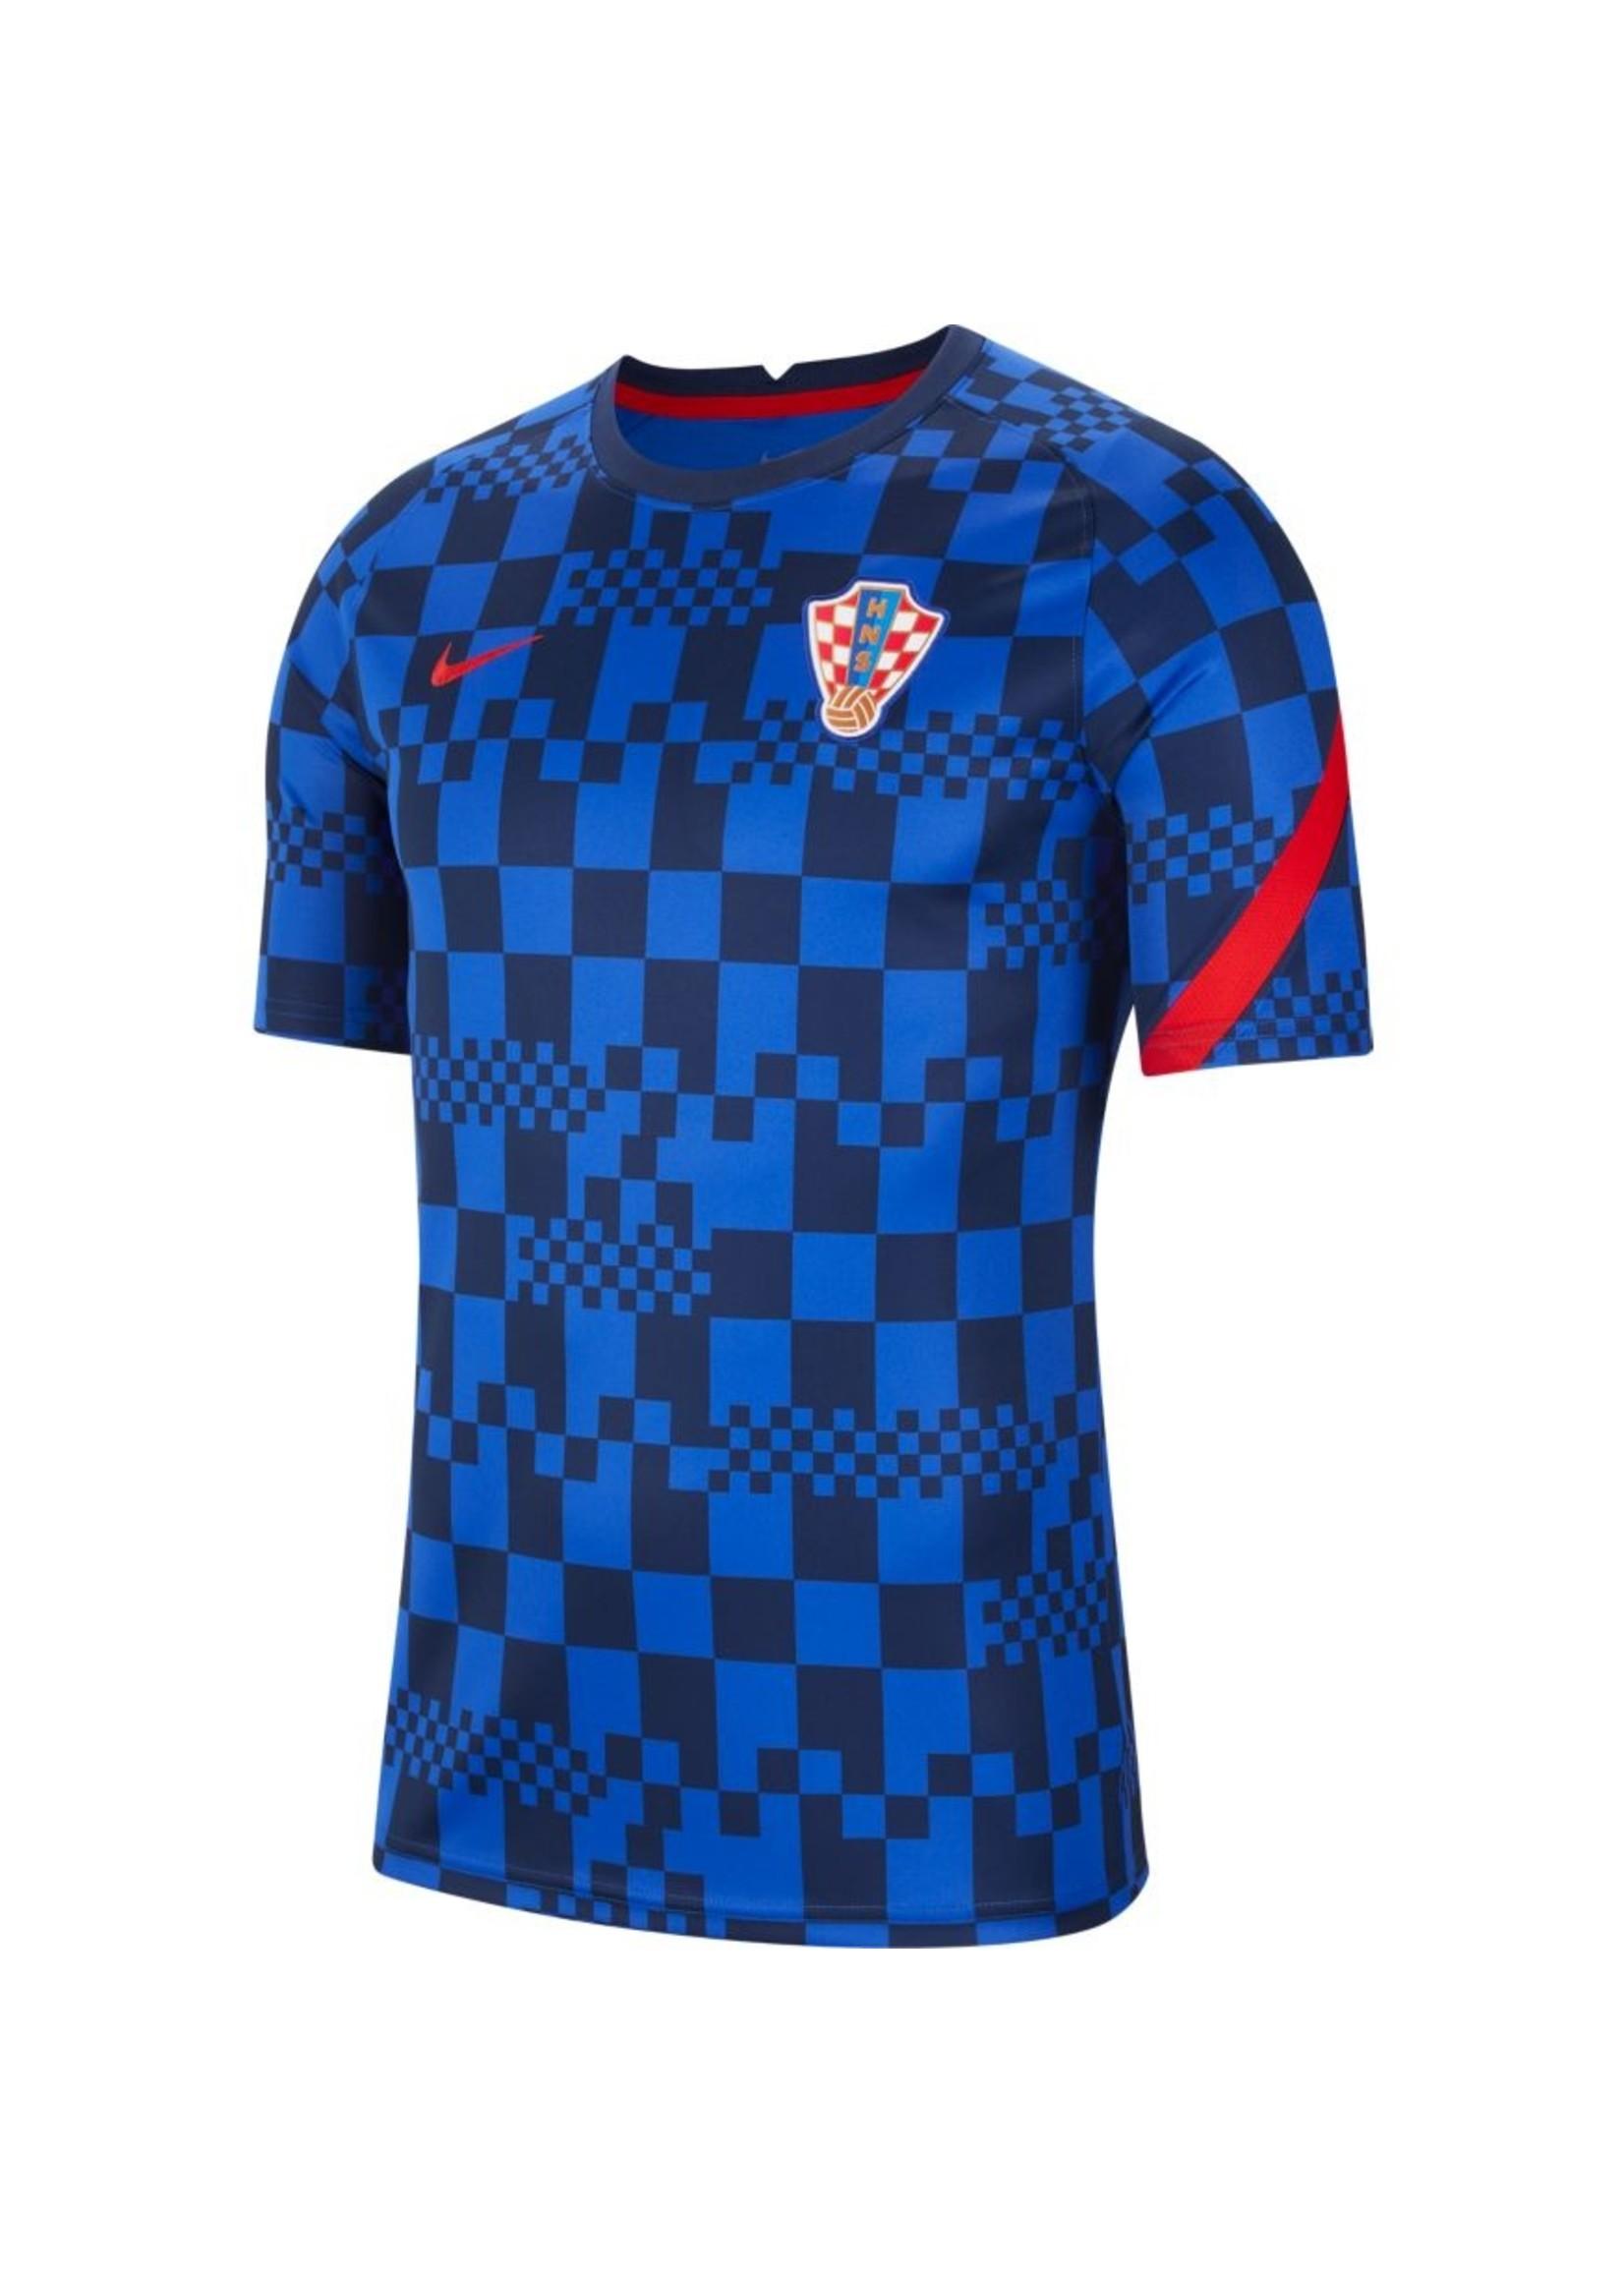 Nike Croatia 20/21 Training Jersey Adult